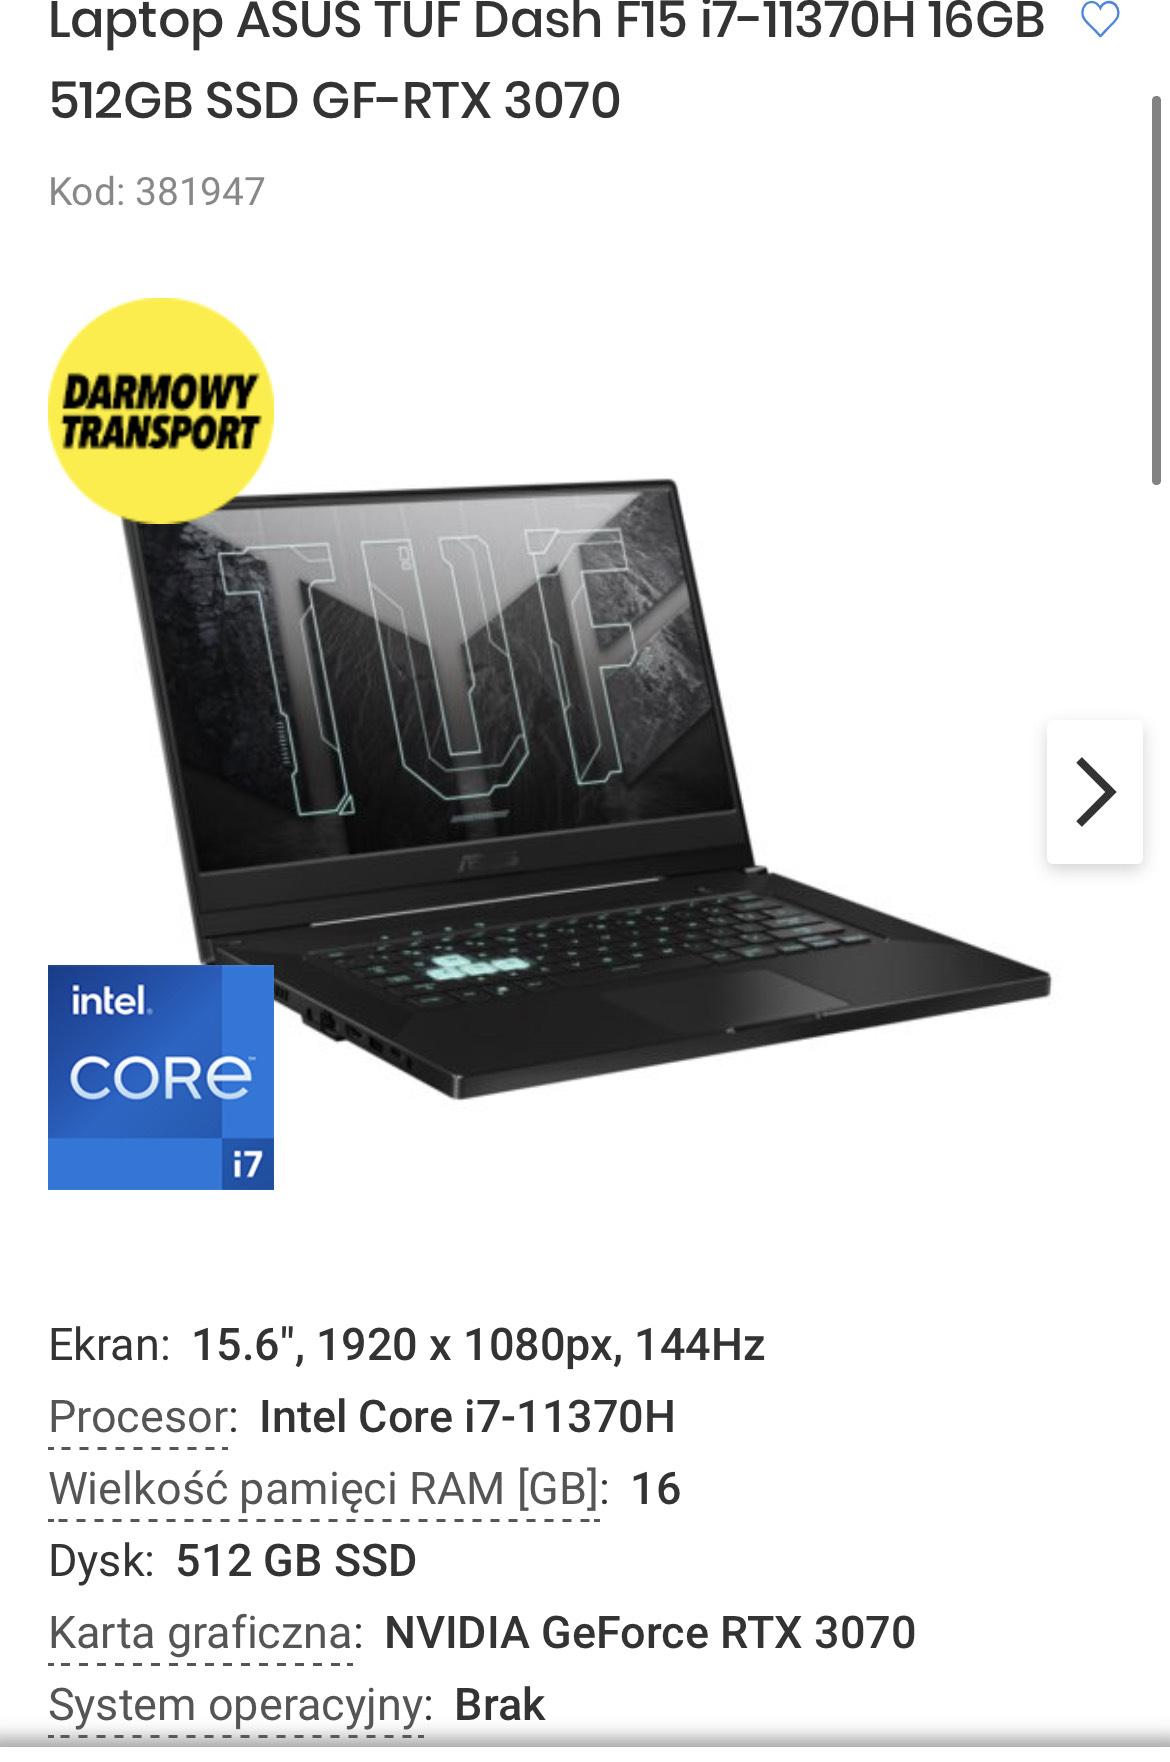 Laptop ASUS TUF Dash F15 i7-11370H 16GB 512GB SSD GF-RTX 3070